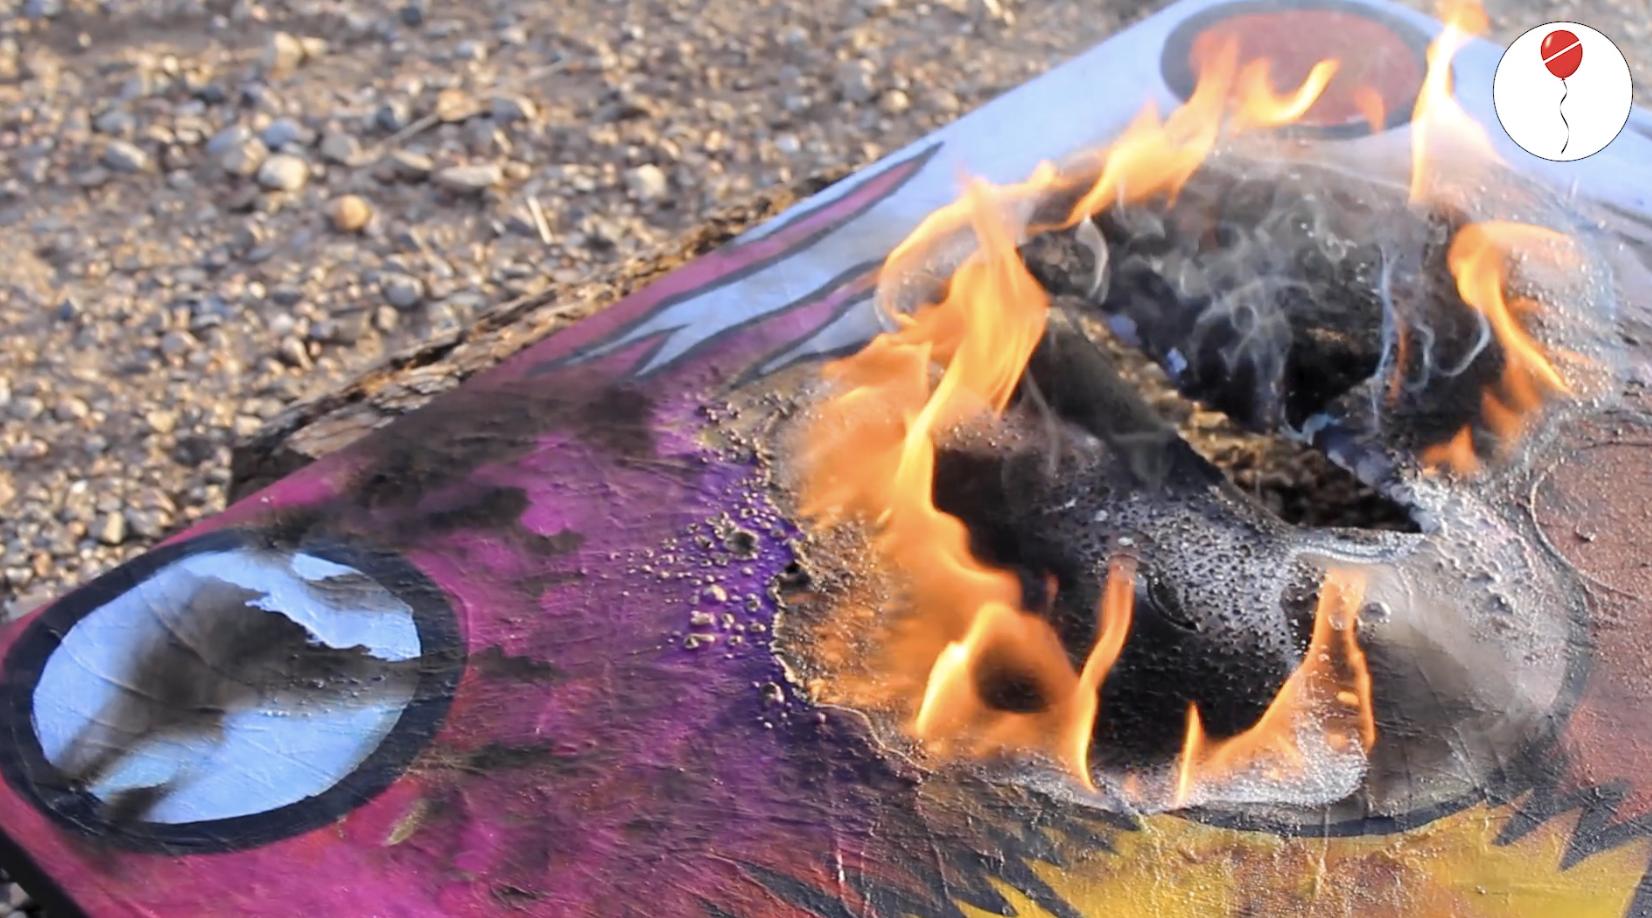 #SharpBeat 163: Make art out of art